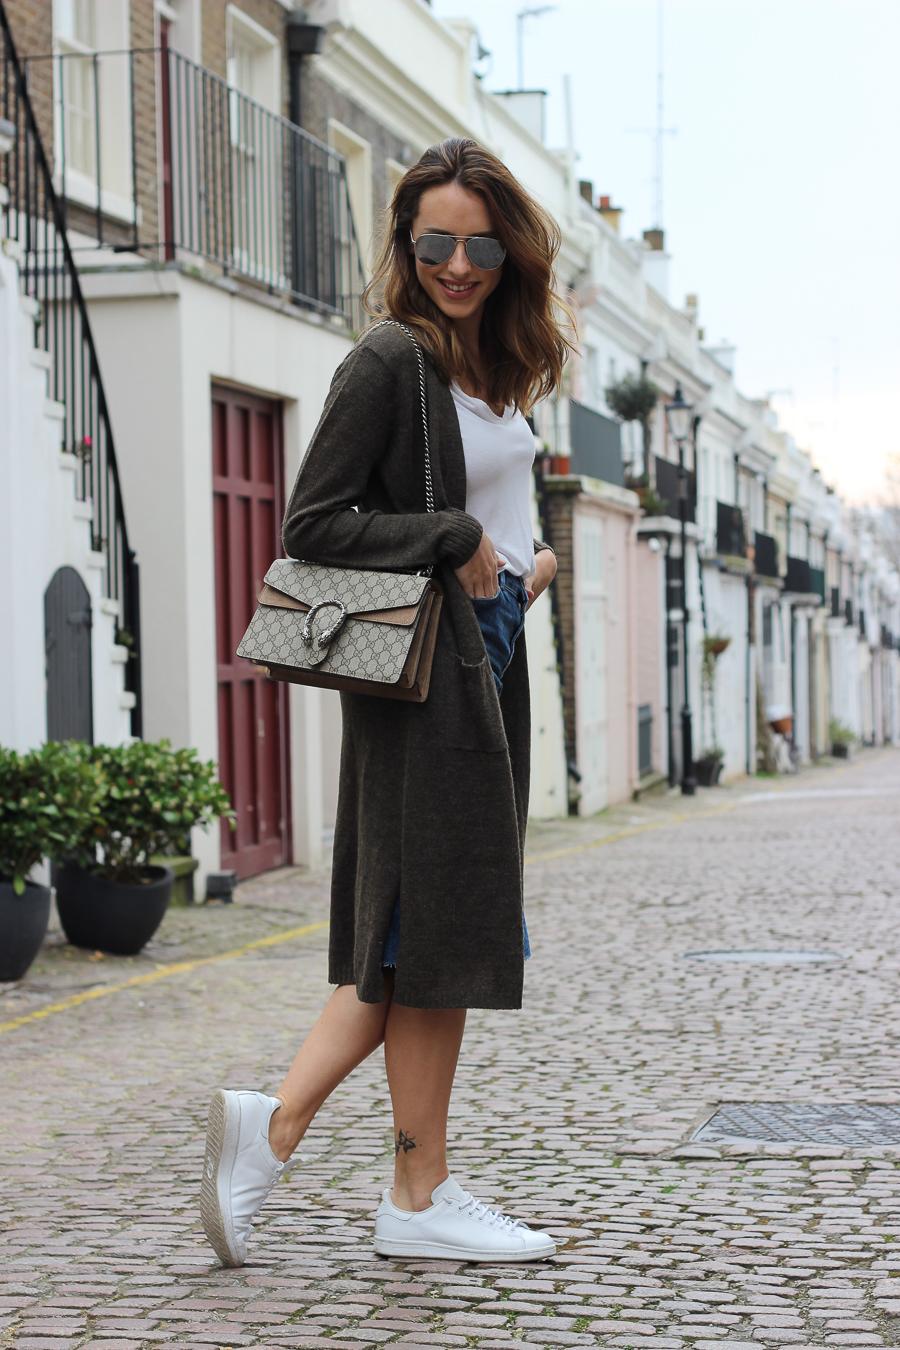 Clutch and carry on - uk fashion blogger - uk travel blogger - sabrina chakici - matalan cardigan, zara denim midi skirt, gucci dionysus supreme-8